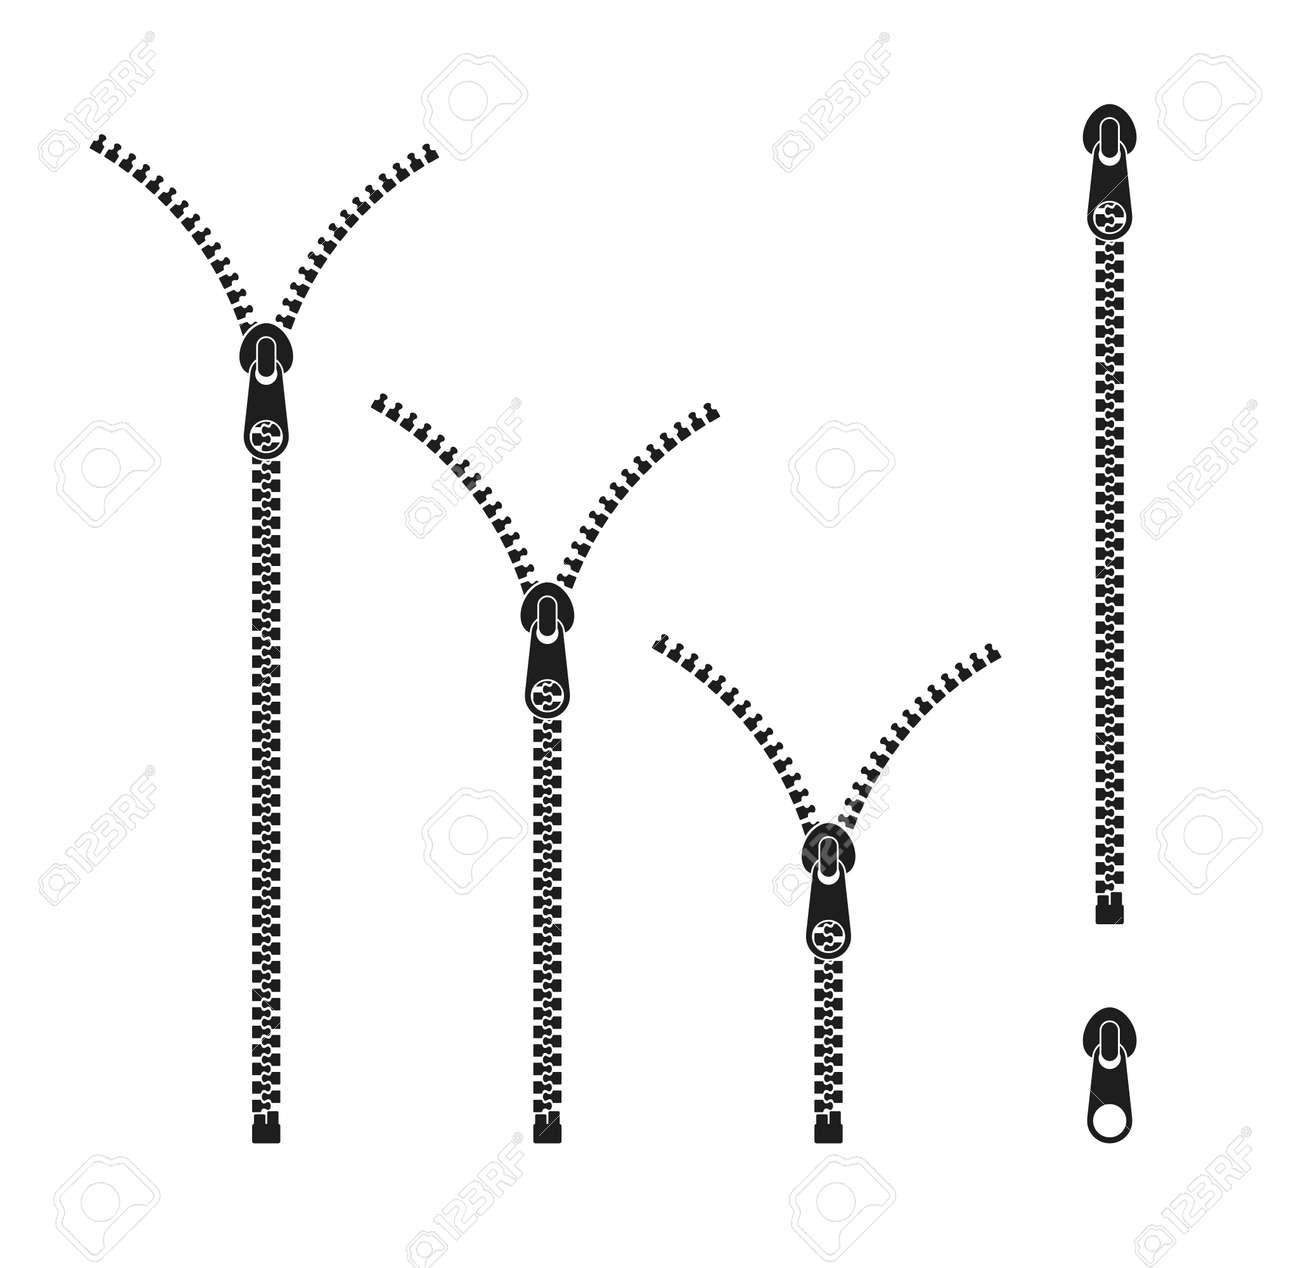 Zipper Icon set. - 123416262